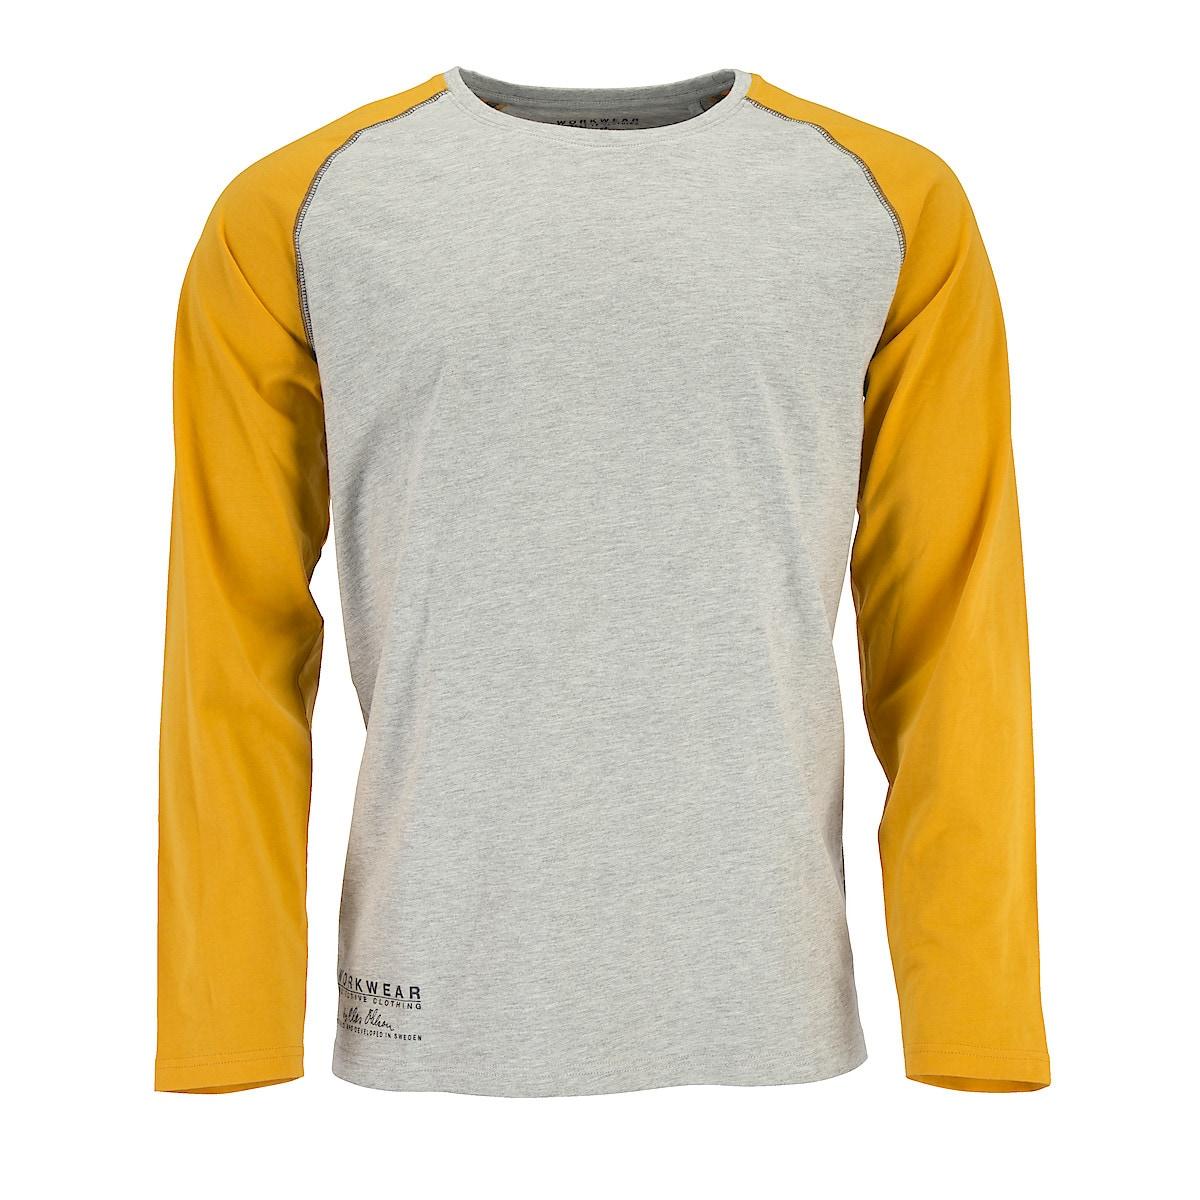 Långärmad t-shirt grå/ockra